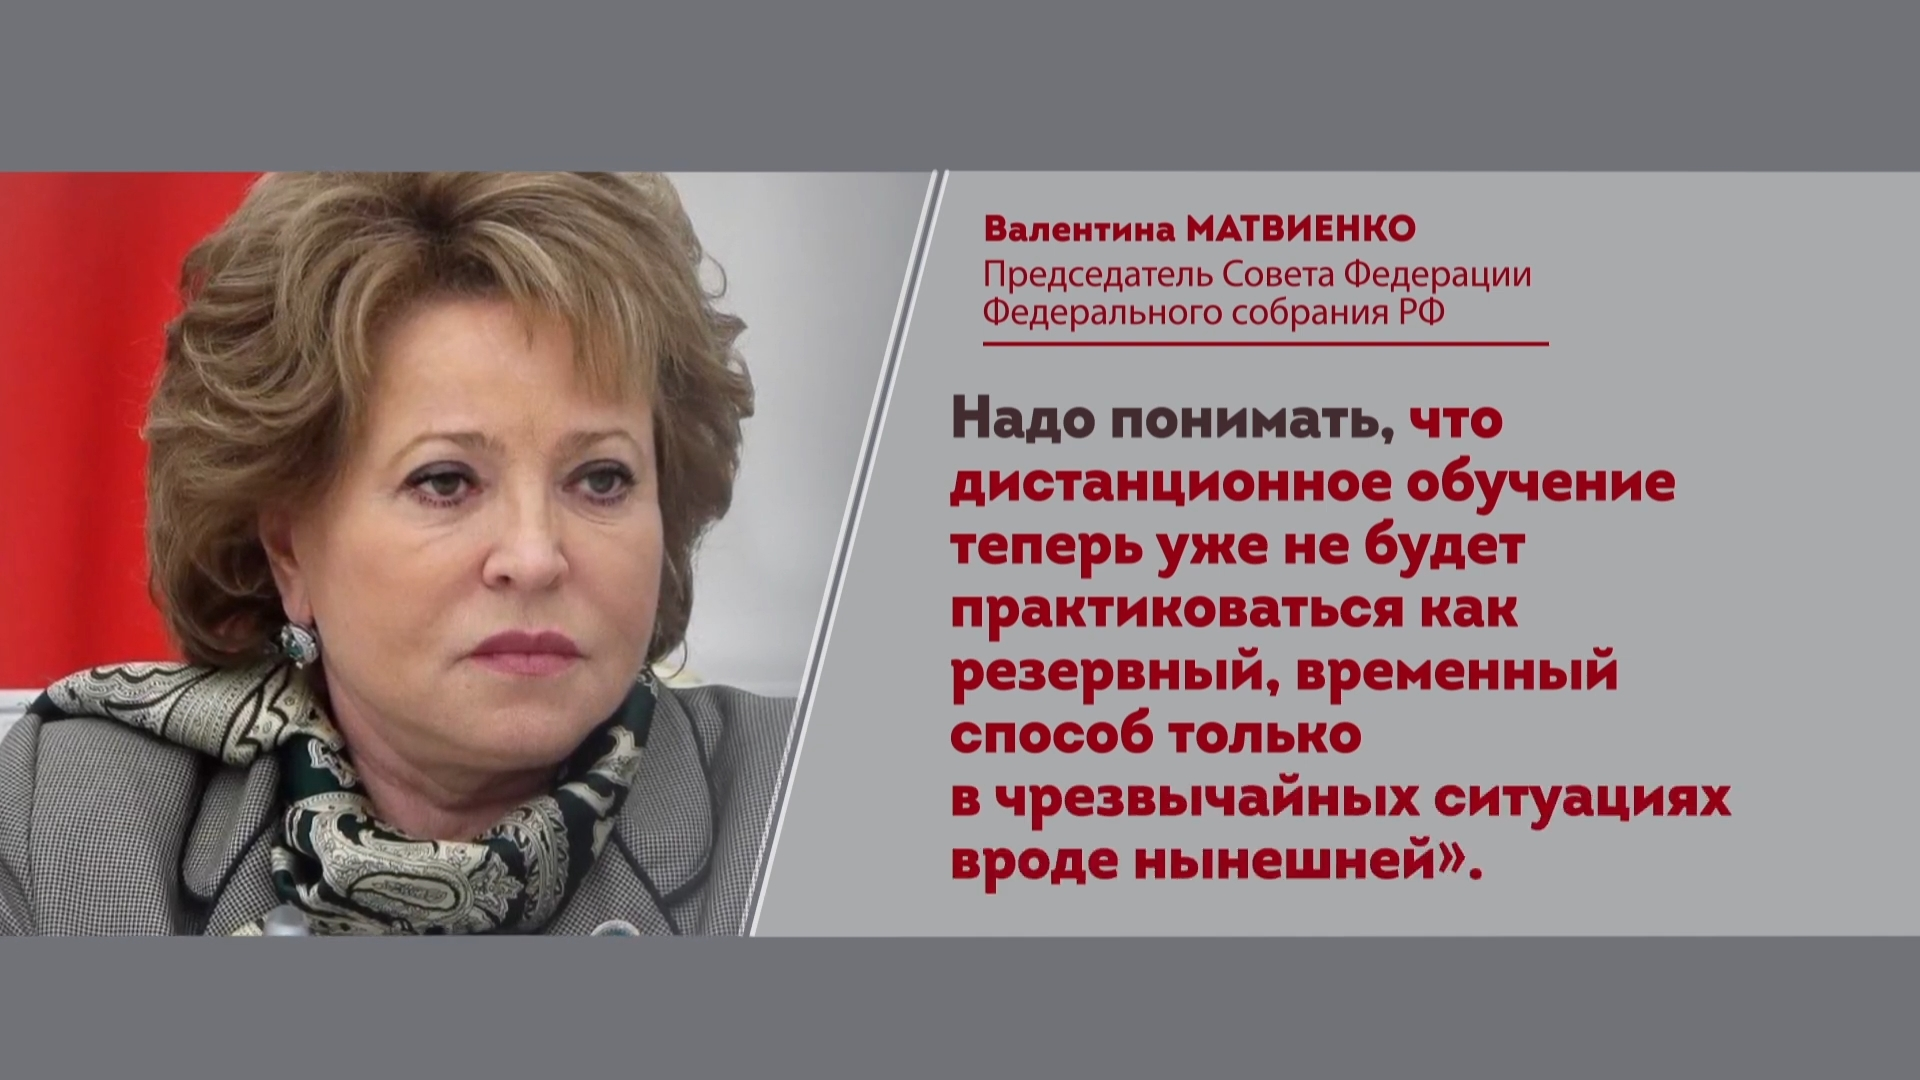 20200501-БесогонTV «У кого в кармане государство»-pic12